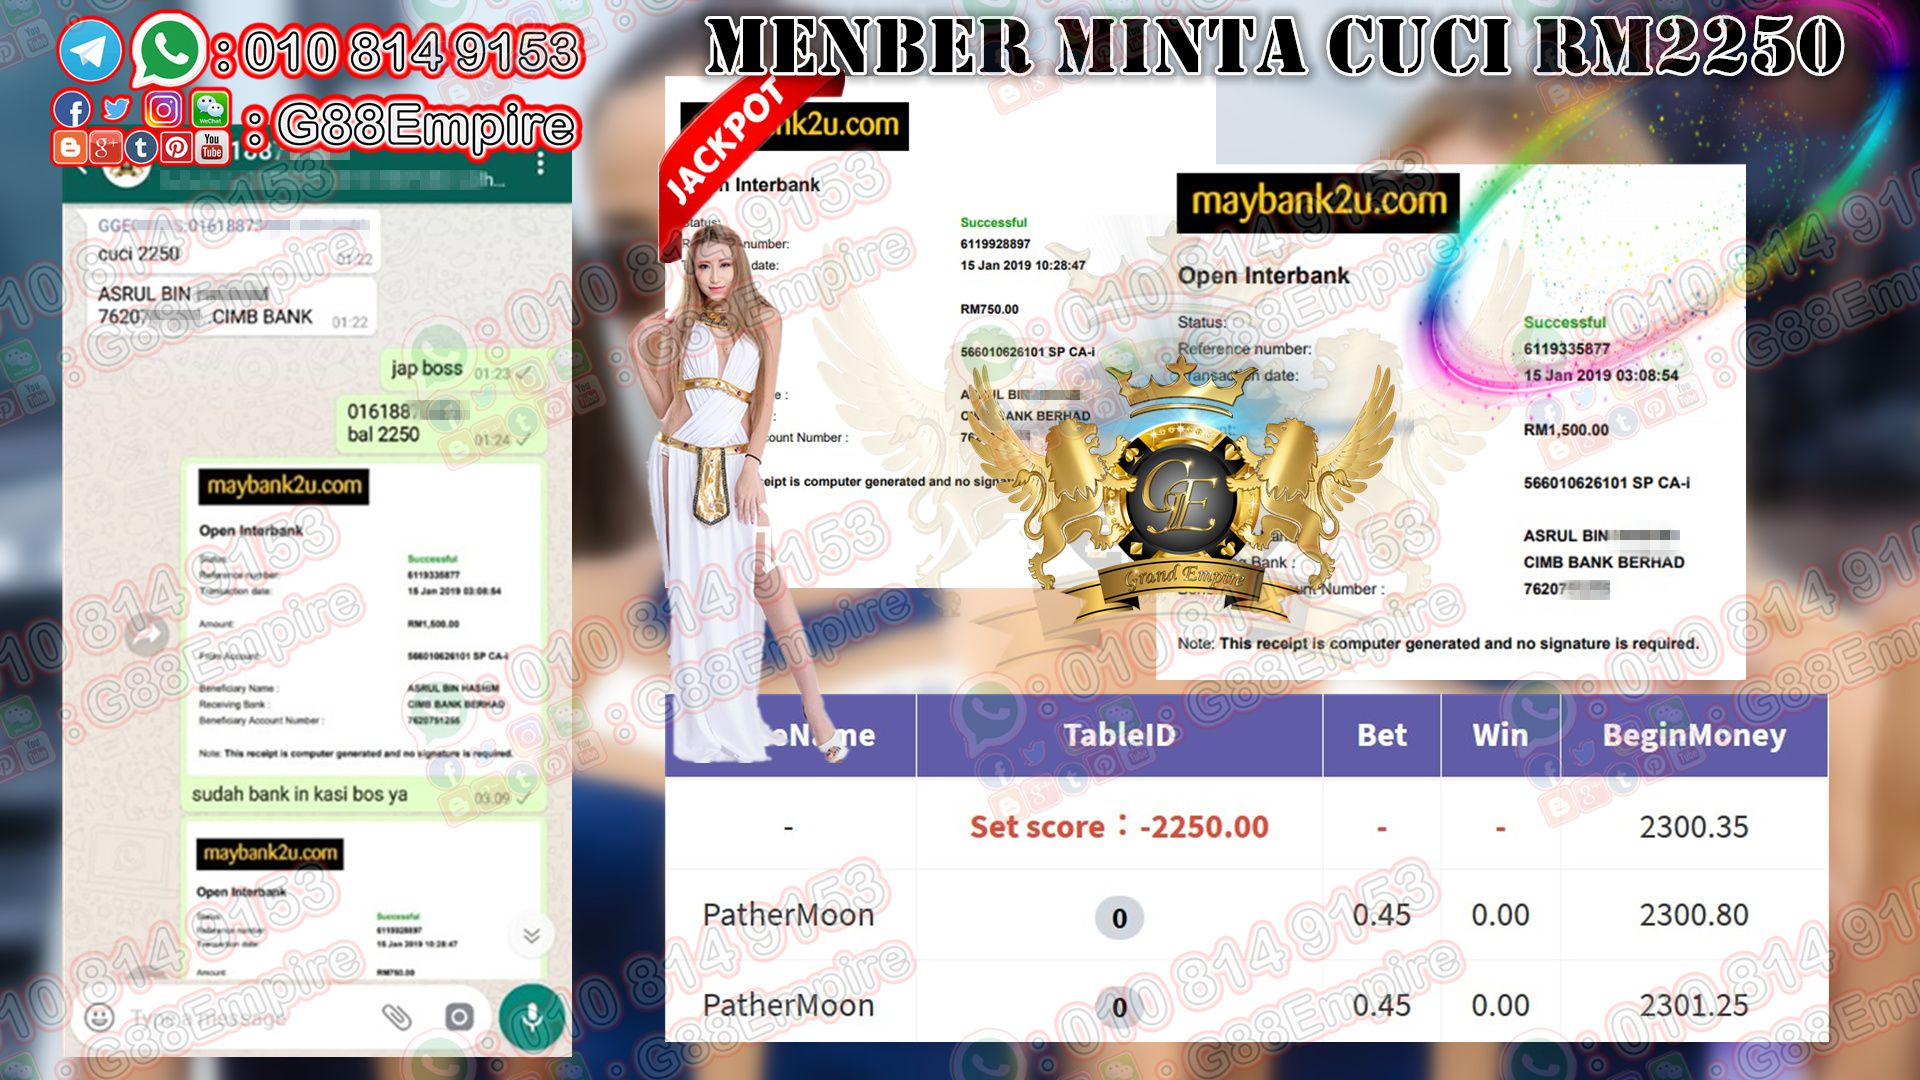 Grand Empire Whatsapp *918kiss*Random Jackpot Member dpt Random Jackpot bernilai RM2250 Wechat : G88empire…